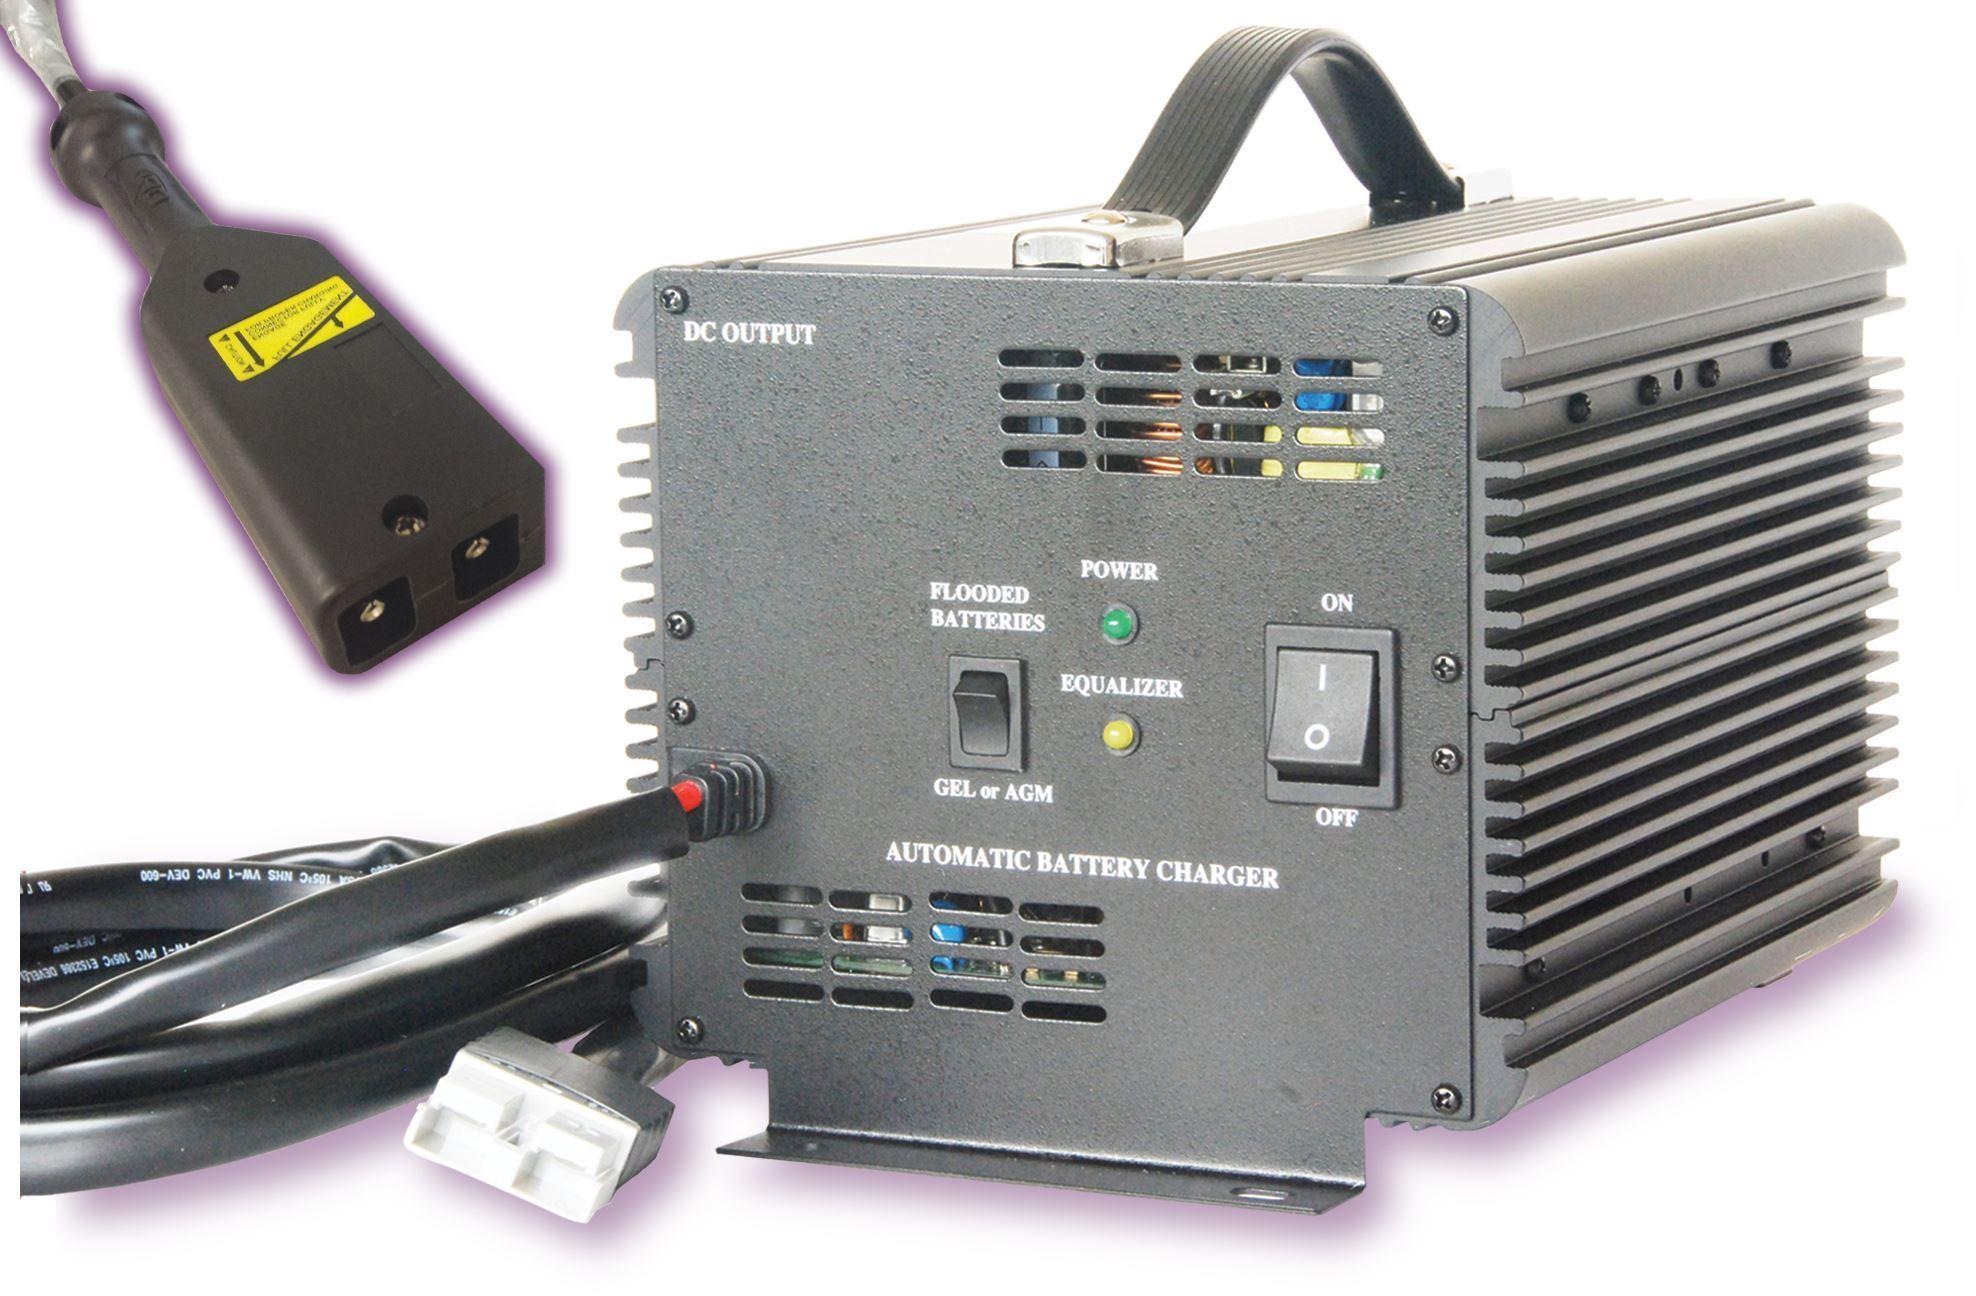 yamaha golf cart 36 volt wiring diagram ecartparts.com | golf cart parts & accessories schauer ...